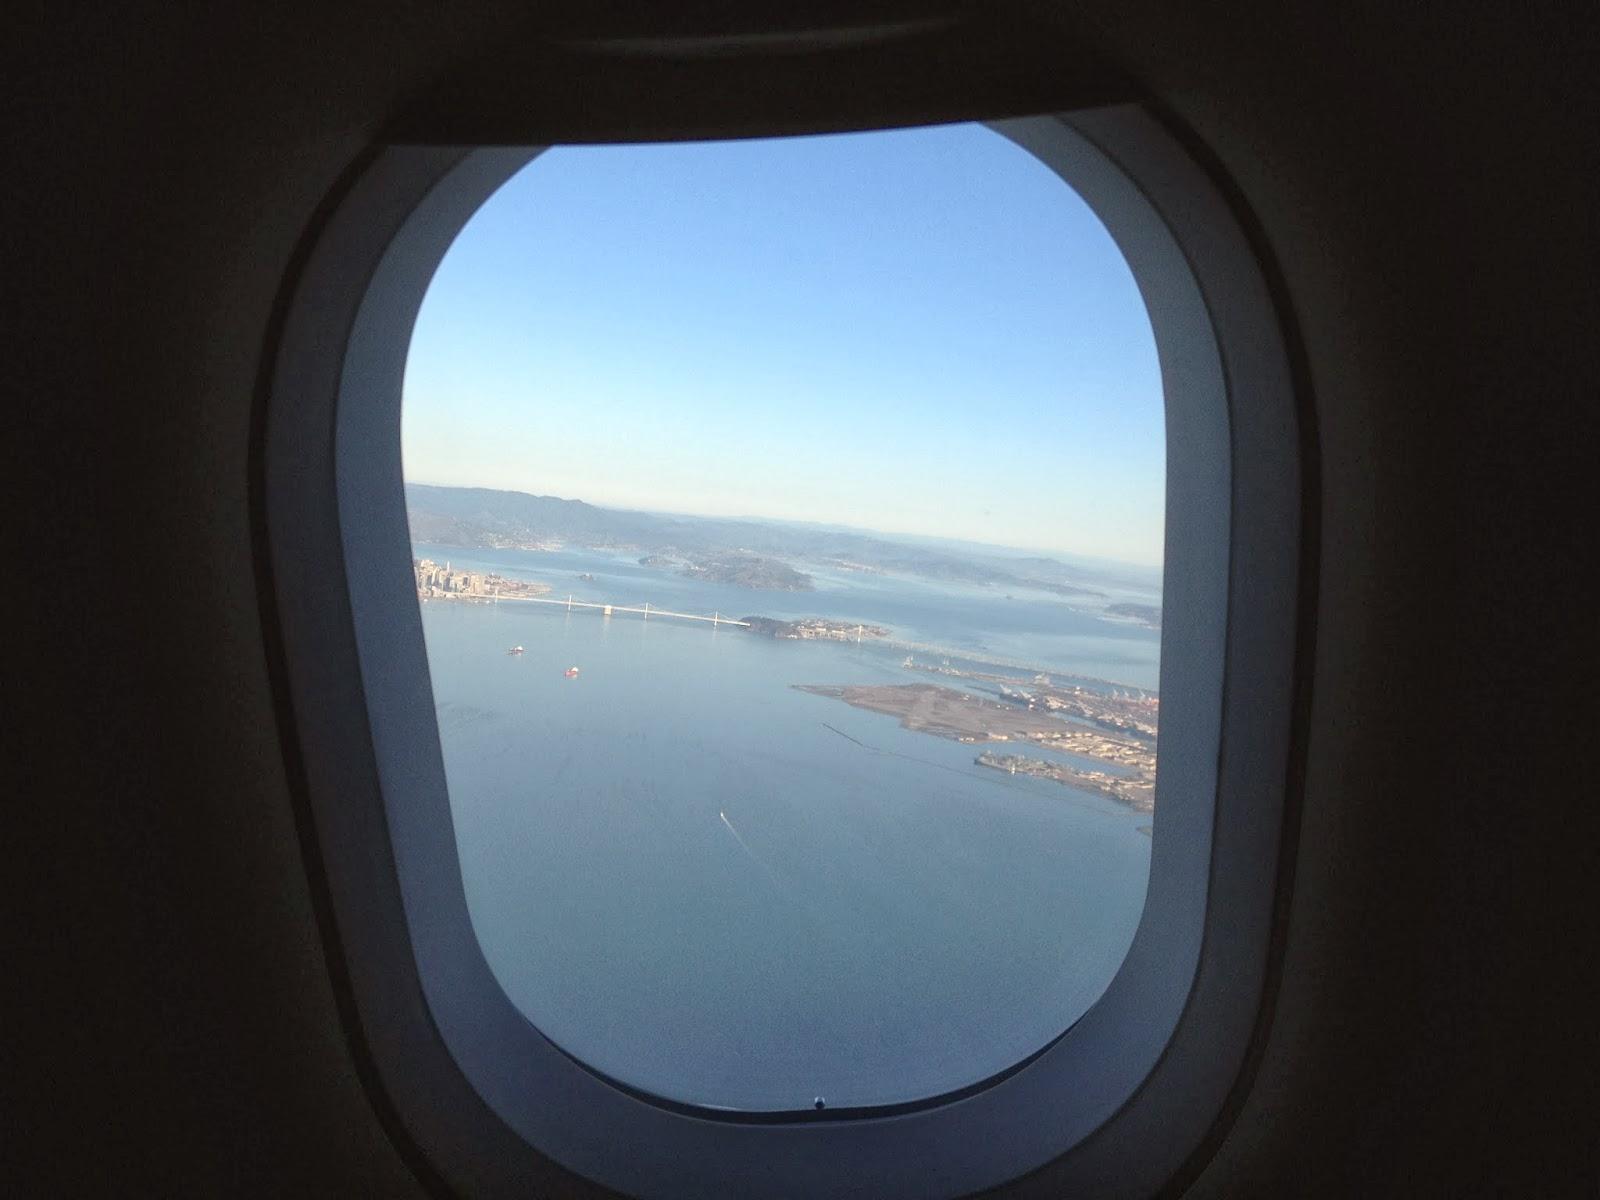 Mystery Playground: Airplane Window Travel Photos